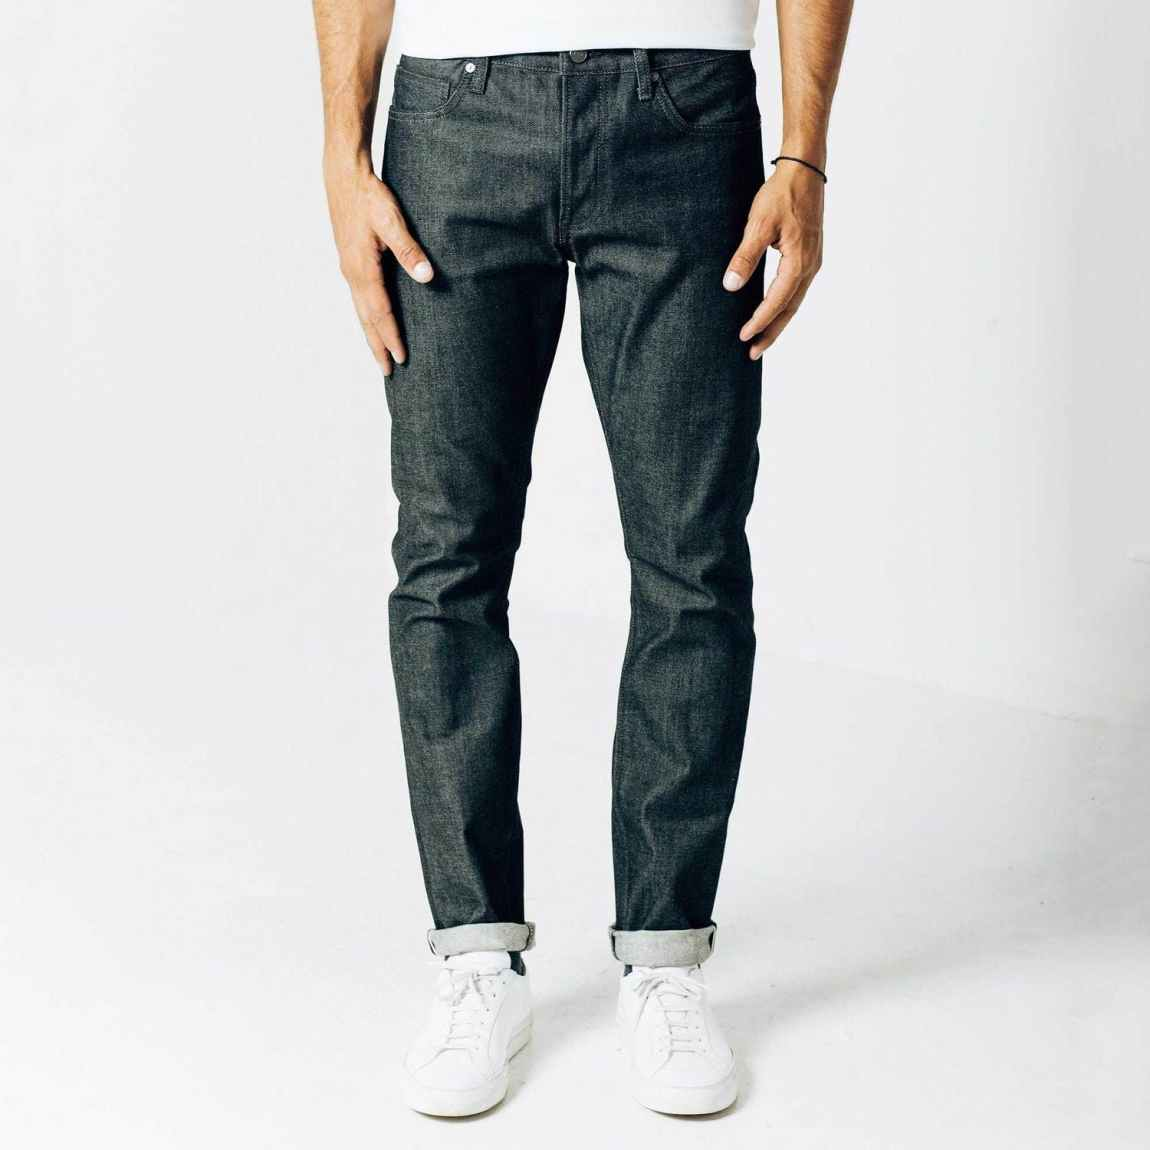 dstld, dstld jeans, raw denim, tonal stitching, selvedge denim, sanfornized denim, dark blue jeans, slim jeans